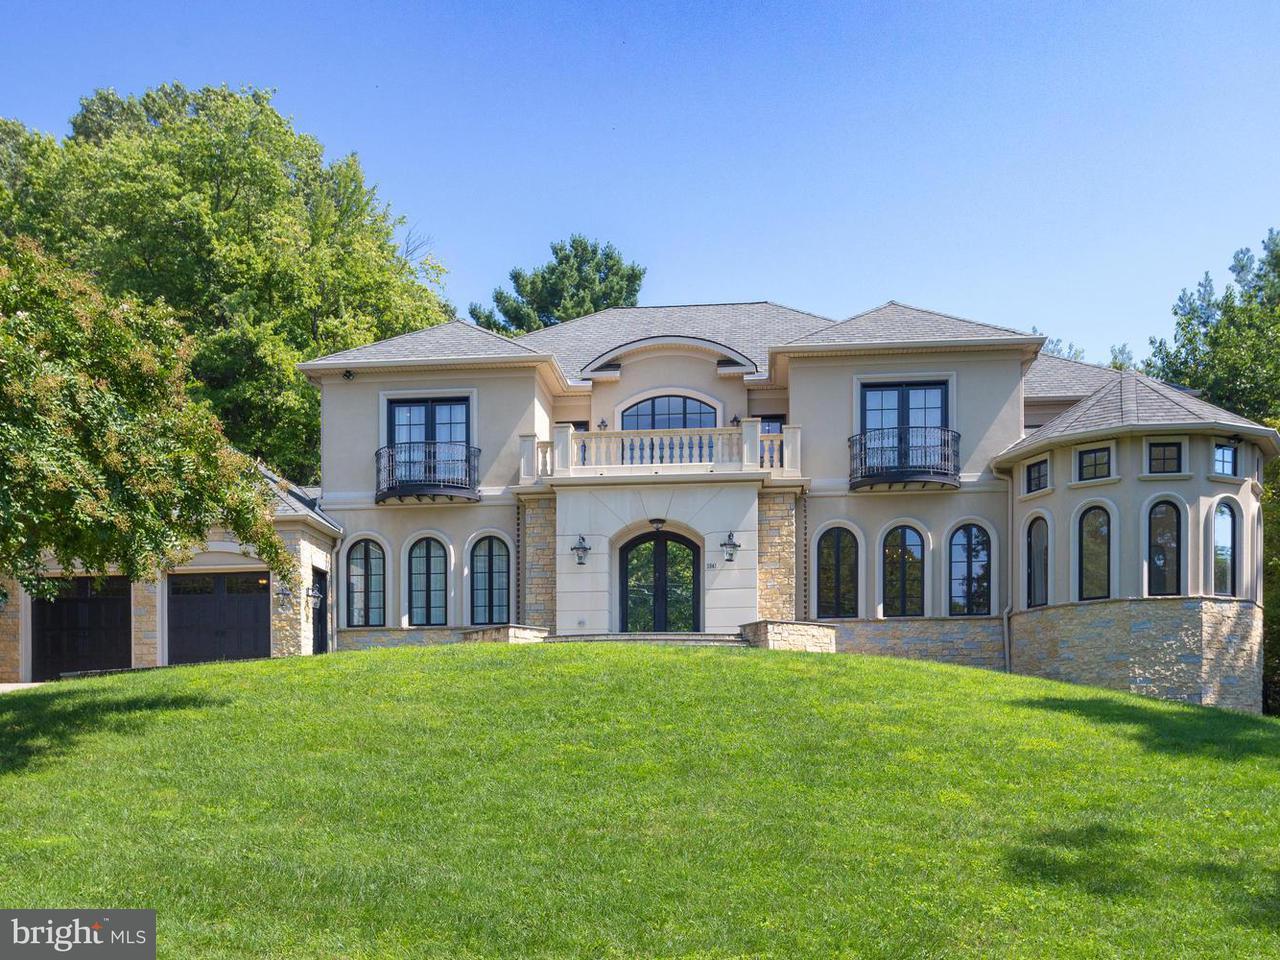 Single Family Home for Sale at 3941 DUMBARTON Street 3941 DUMBARTON Street McLean, Virginia 22101 United States